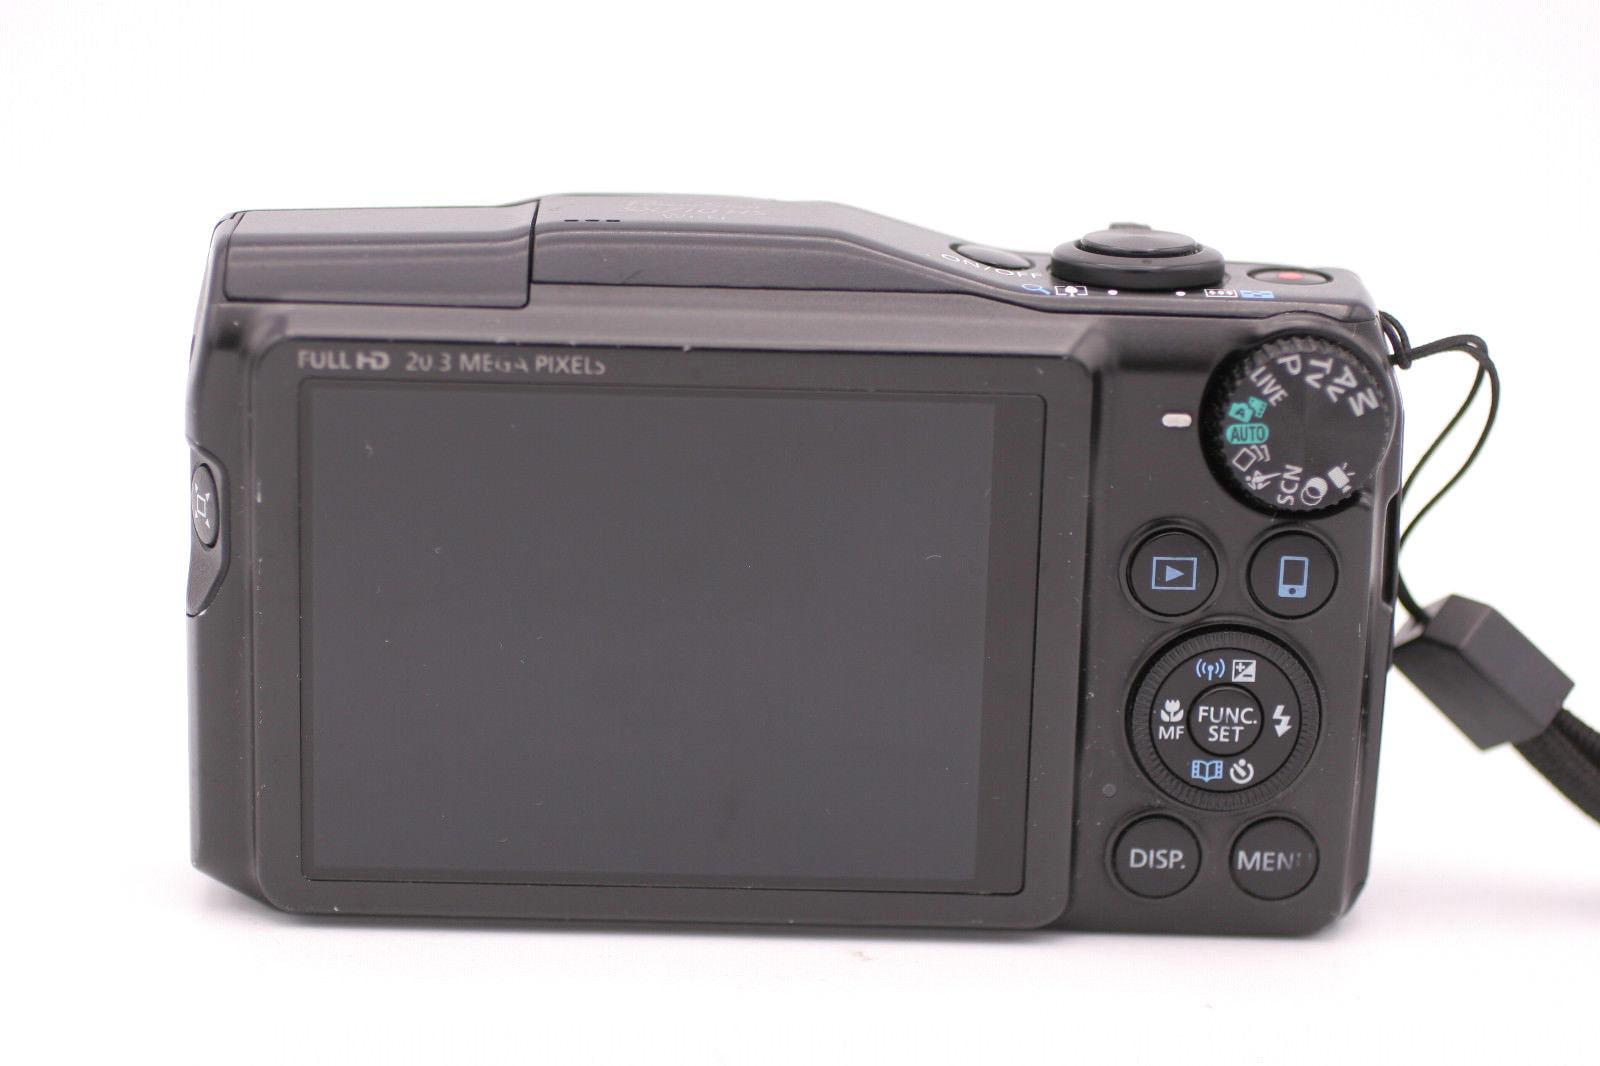 Genuine Similar Items Canon Powershot Sx710 Hs Manual Download Canon Powershot Sx710 Hs Wifi Canon Powershot Hs Digital Camera Black Canon Powershot Hs Digital dpreview Canon Powershot Sx710 Hs